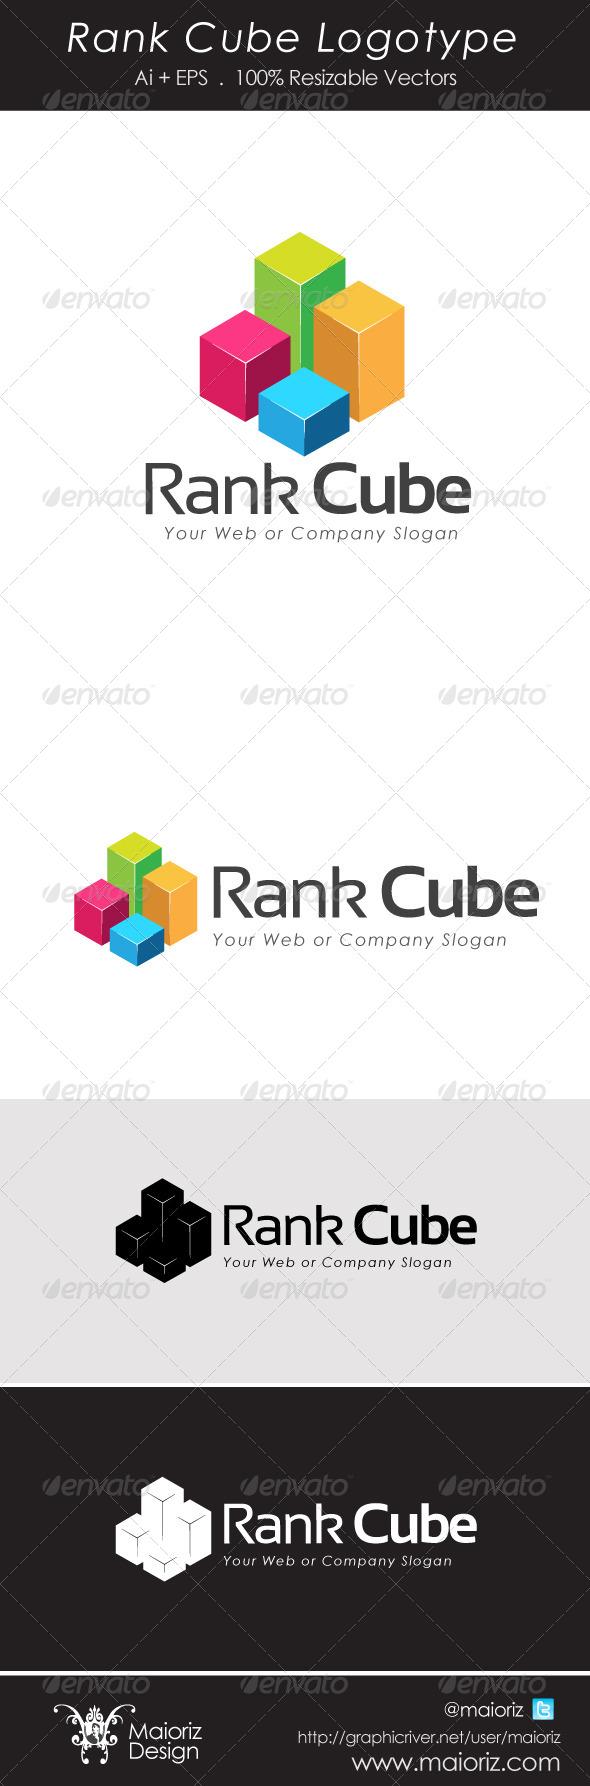 Rank Cube Logotype - 3d Abstract